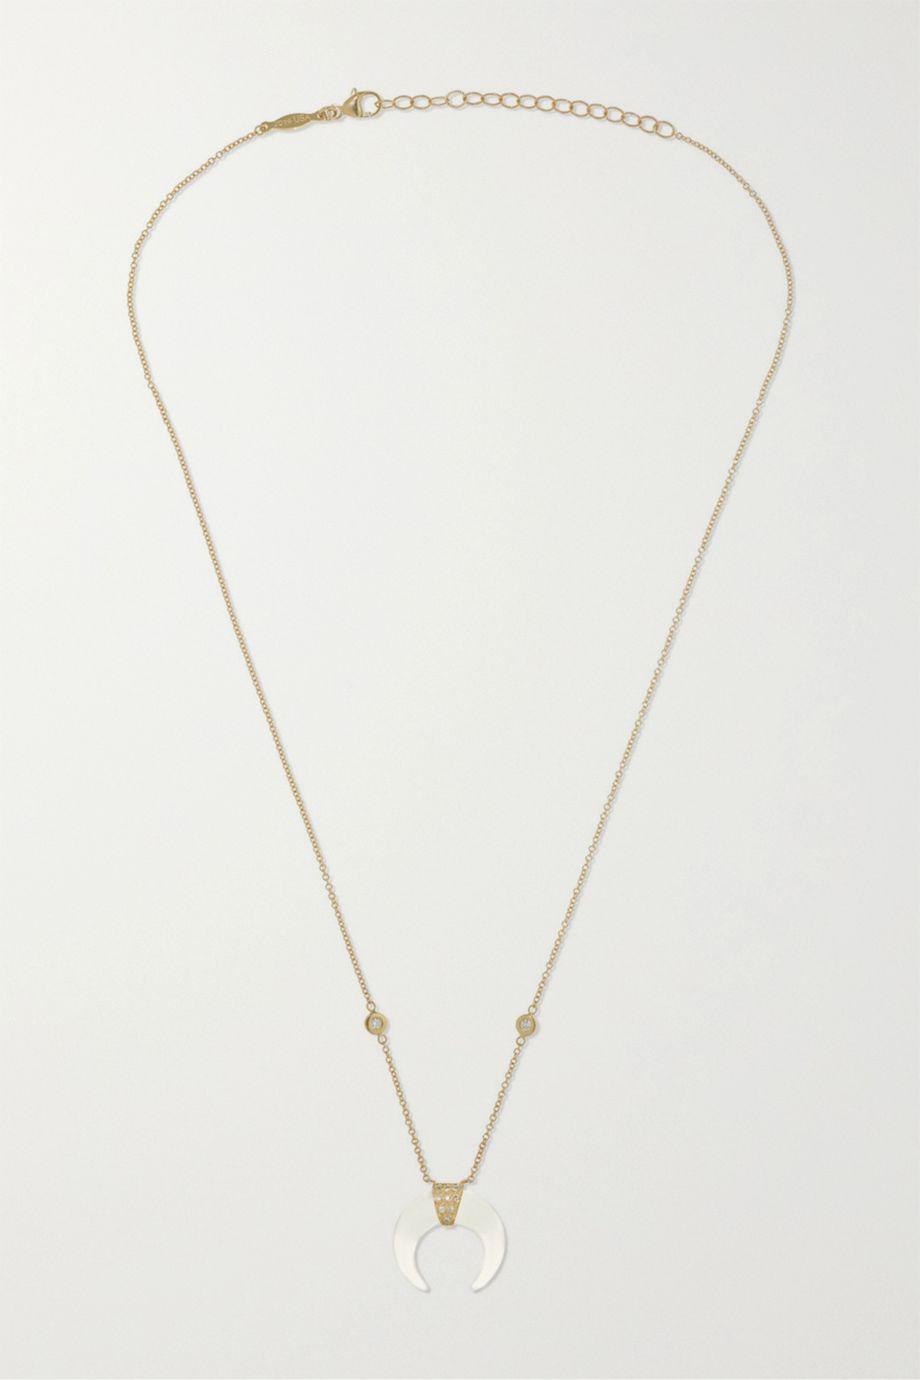 Jacquie Aiche Mini Double Horn 14-karat gold, moonstone and diamond necklace